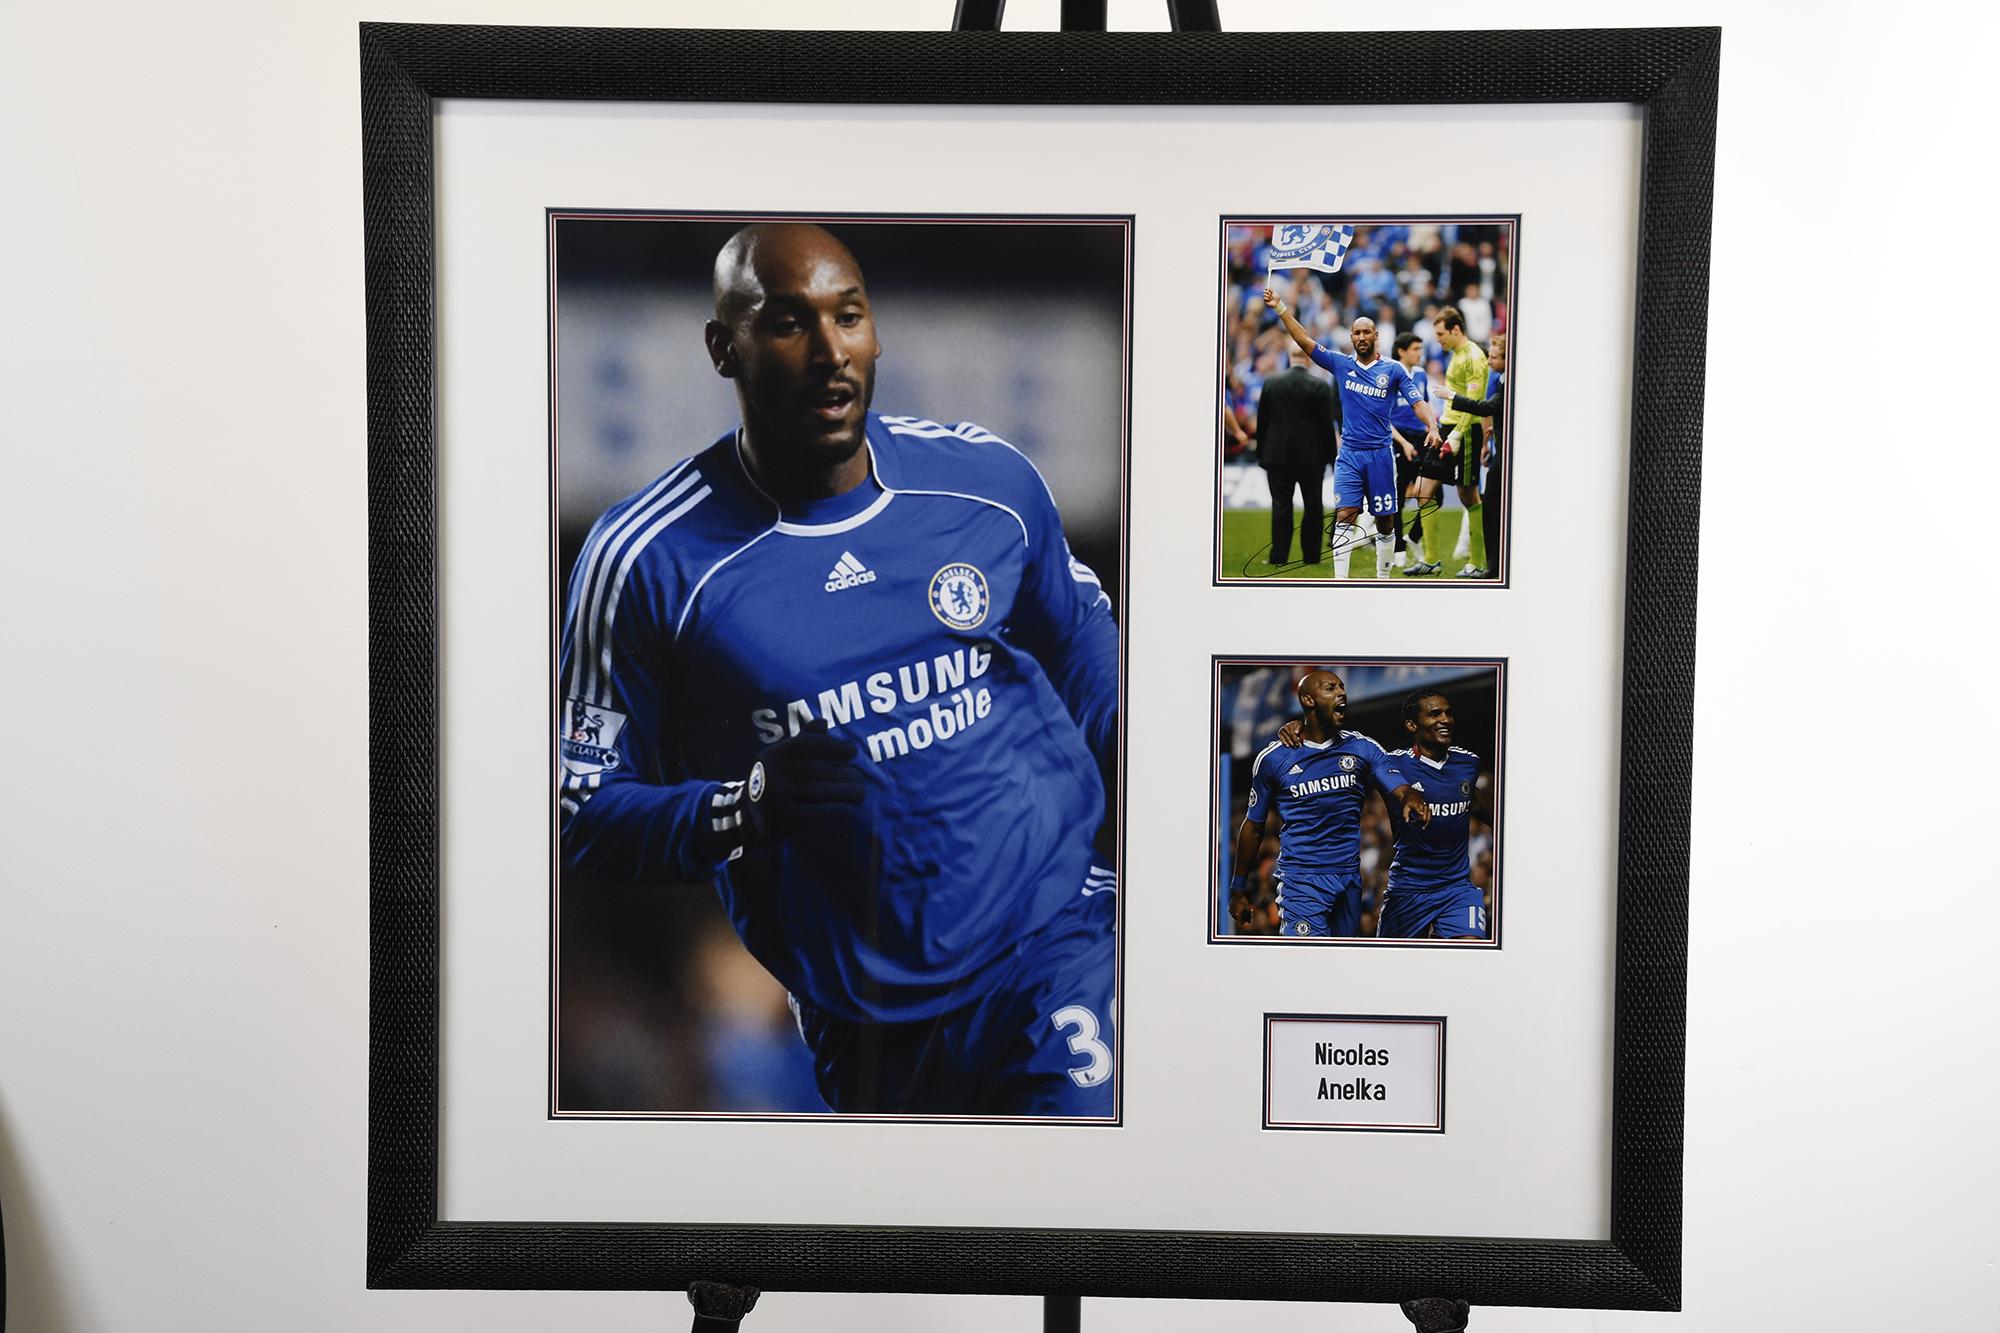 Framed Presentation of Chelsea Footballer Nicolas Anelka.